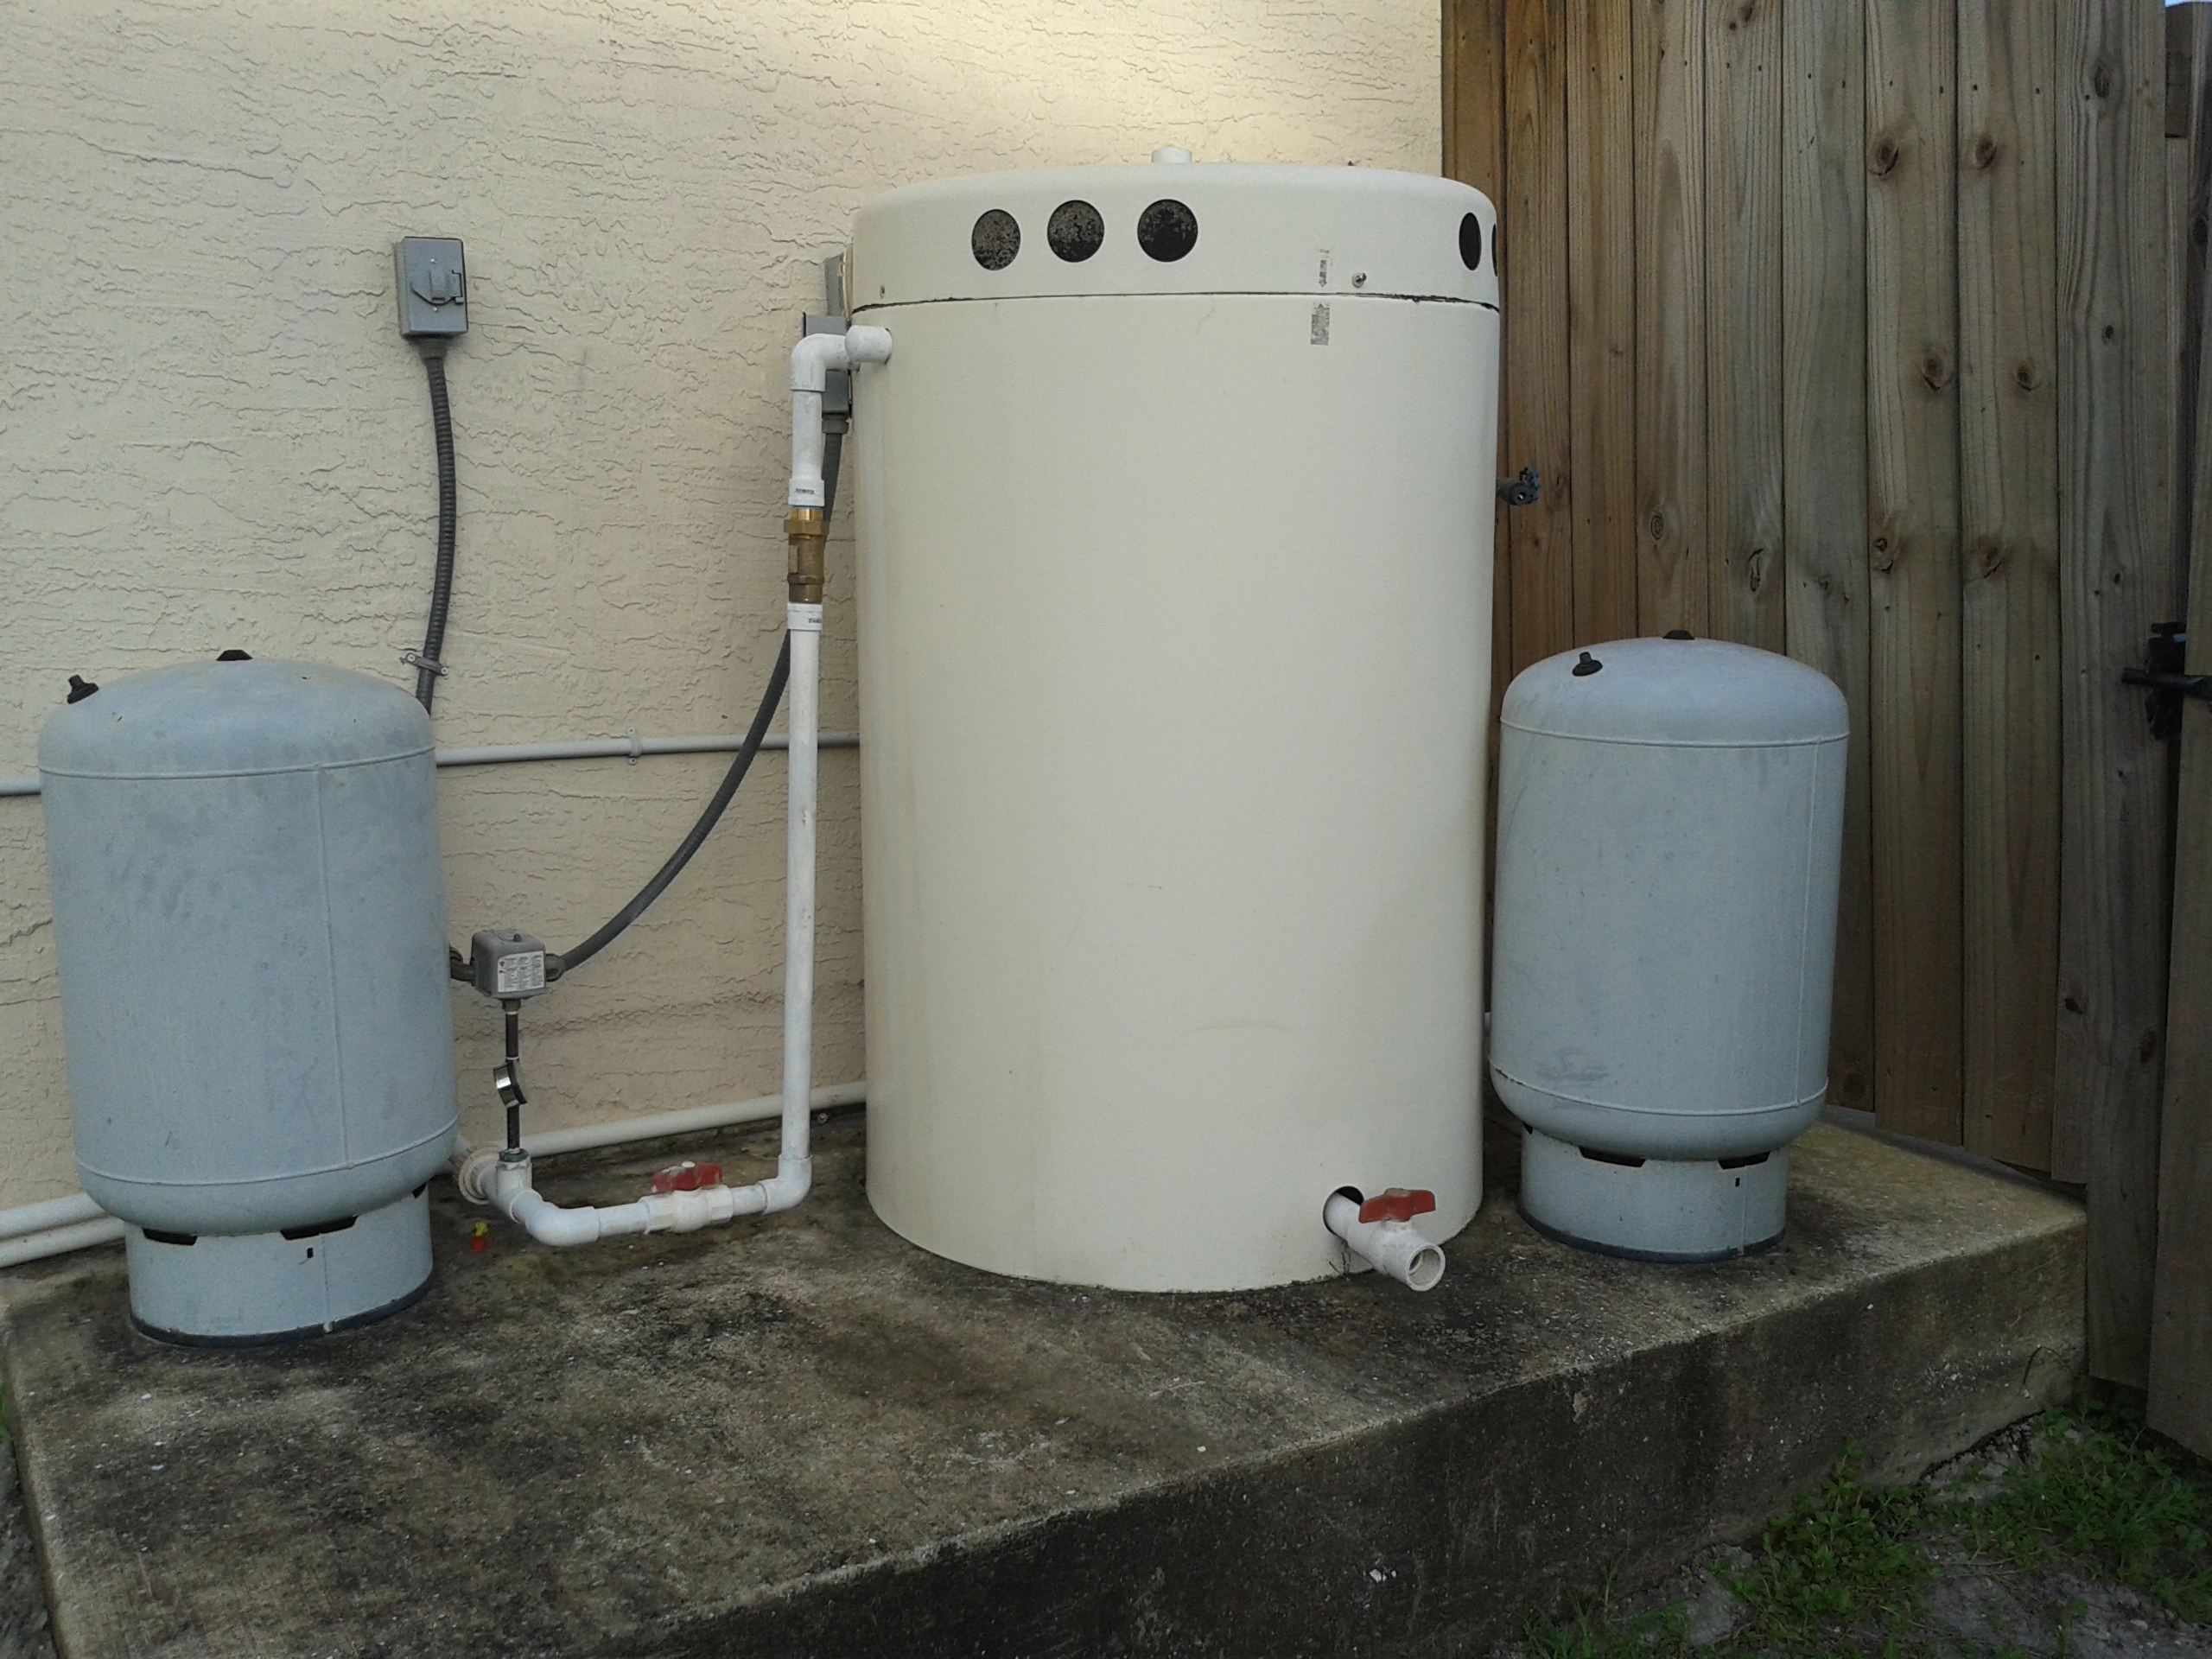 Aerator Tanks Water Medic Of Cape Coral Florida